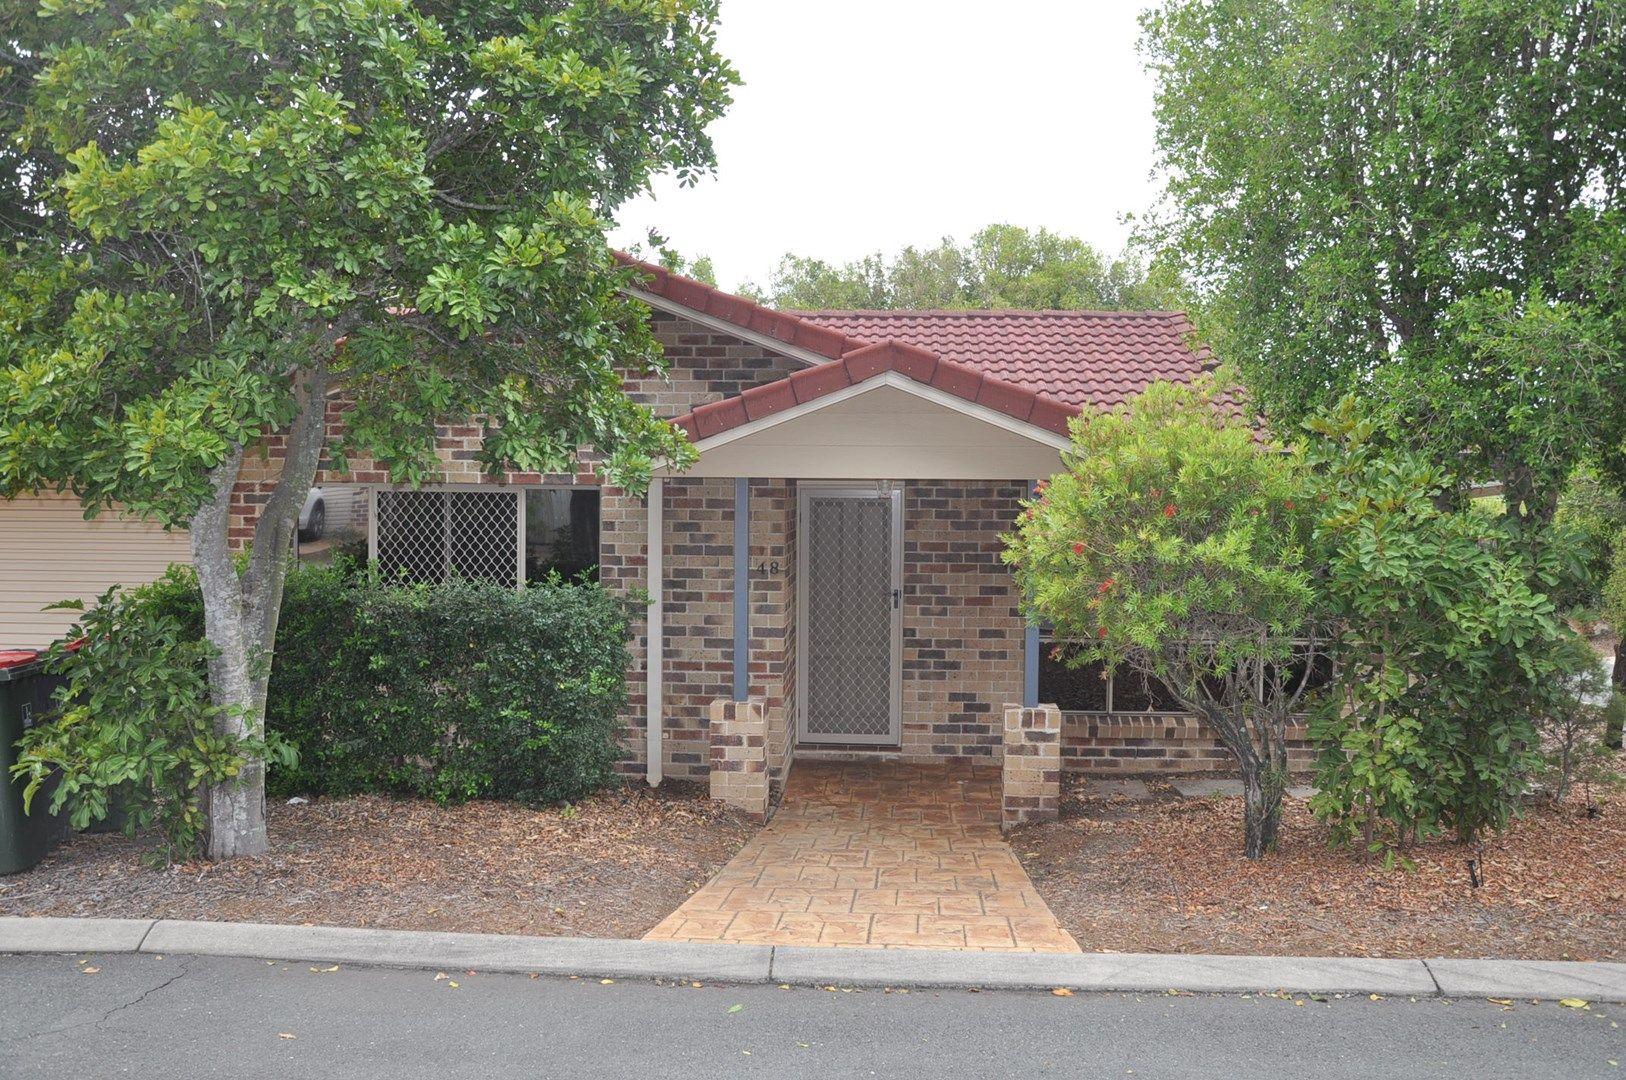 48/45 Farne Street, Sunnybank Hills QLD 4109, Image 0